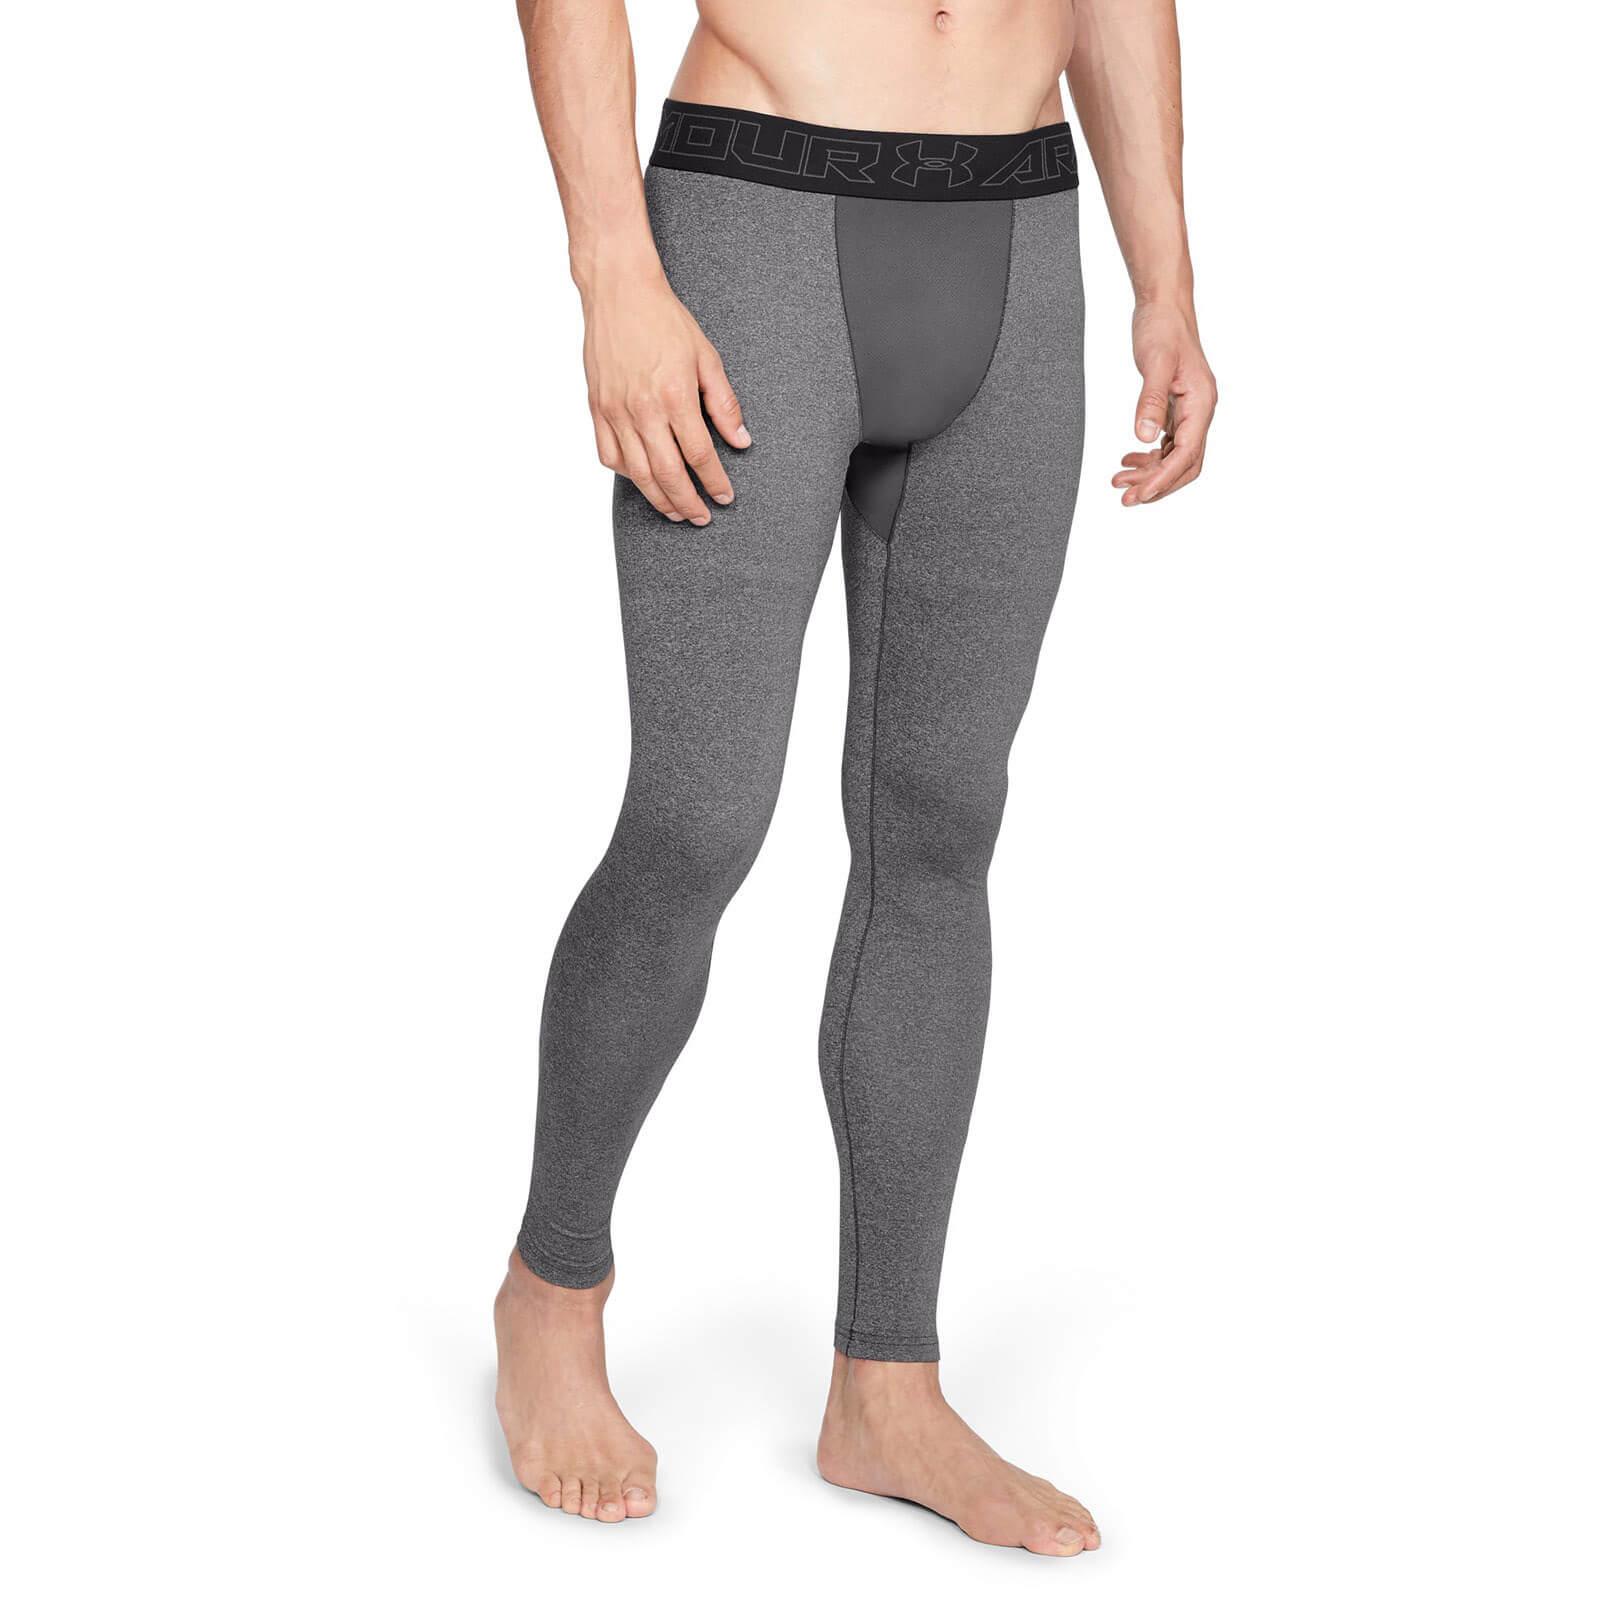 2c1dbdfa03674c Under Armour ColdGear Leggings - Grey | ProBikeKit Canada